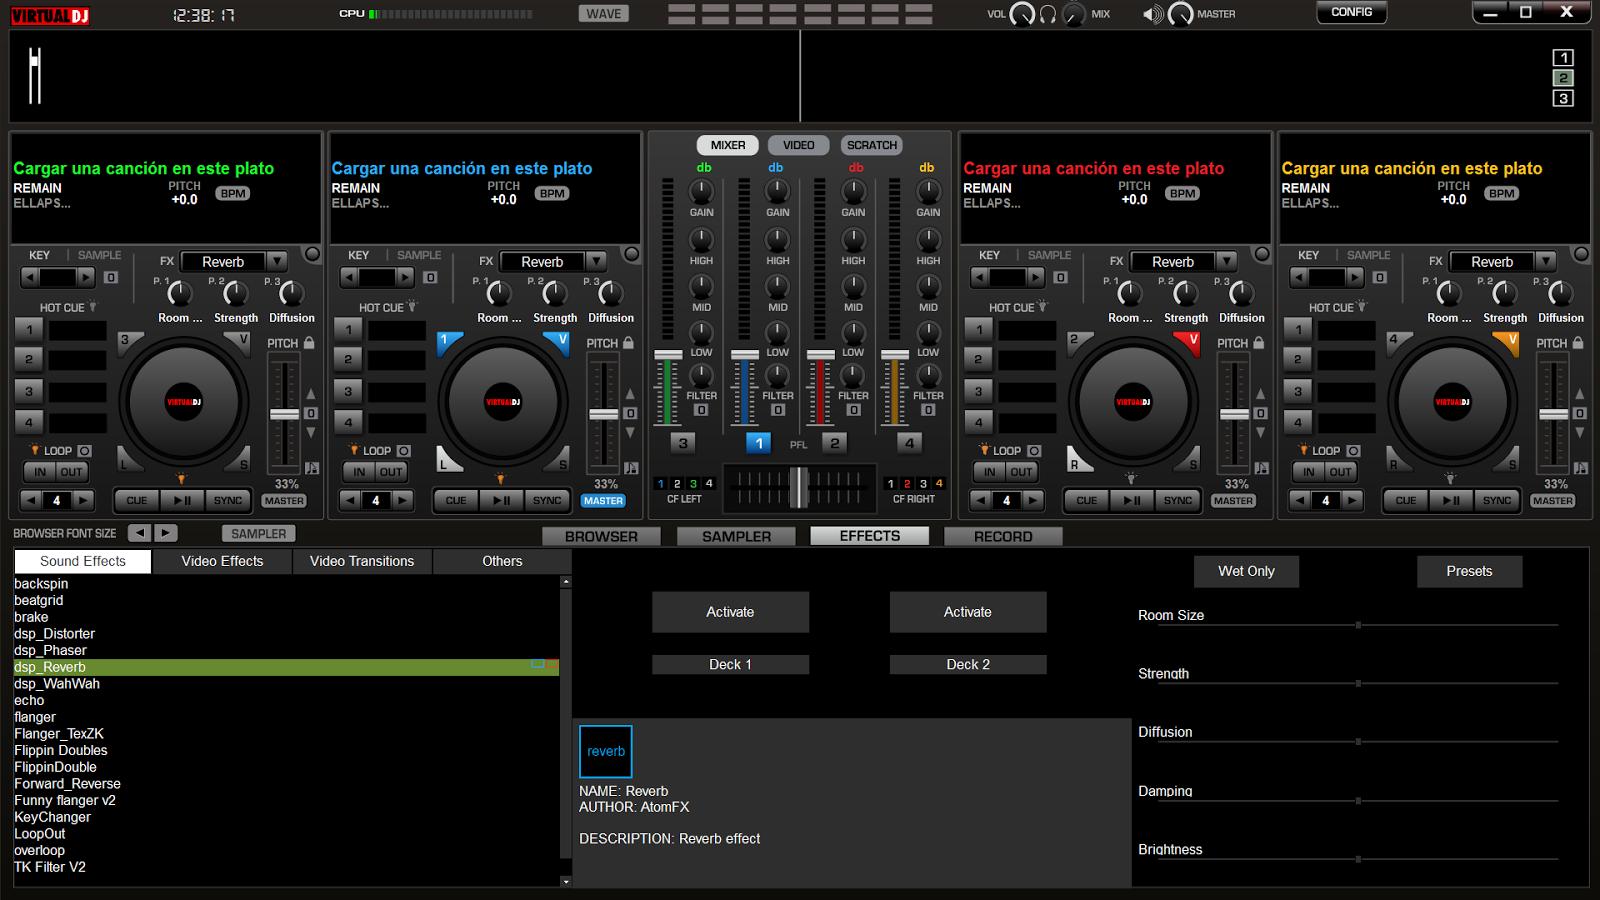 ������ ������ ��������� ���� ������� �����������Virtual DJ Pro 7.4.1 Build 482